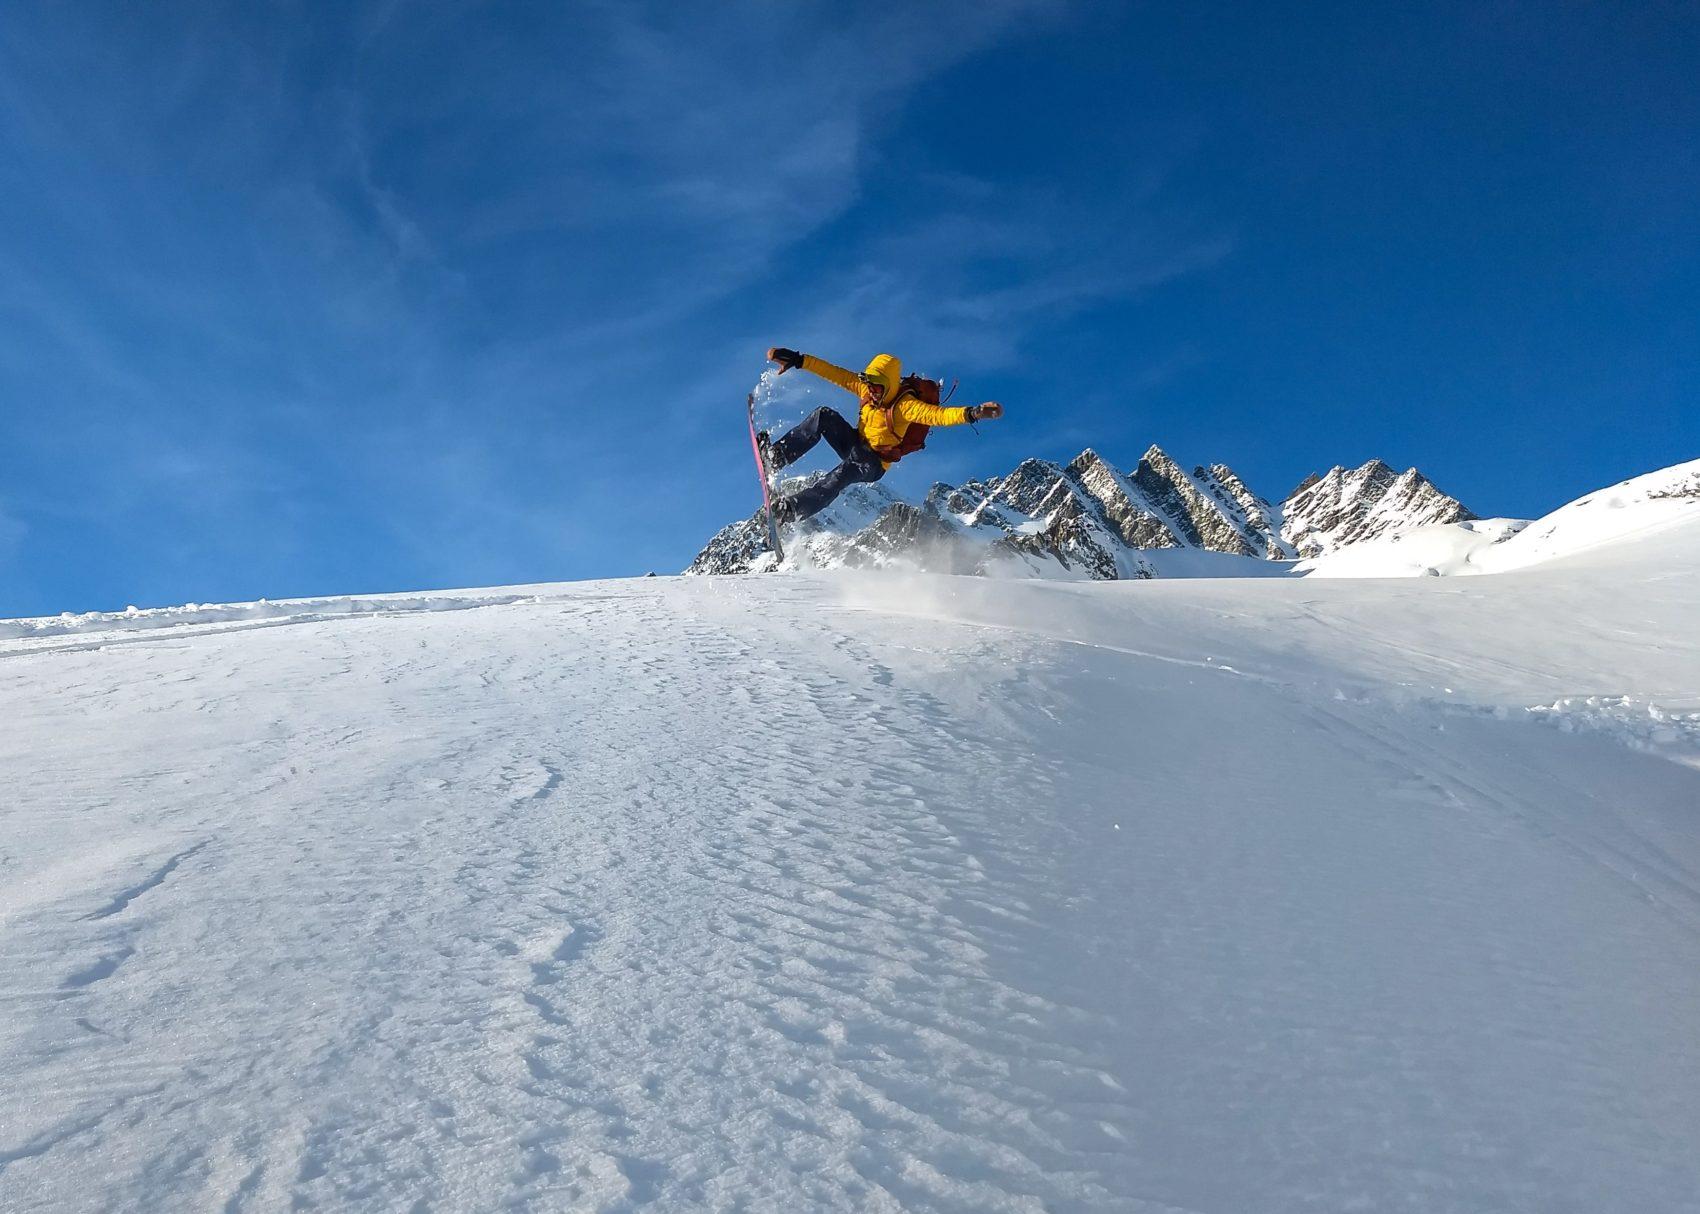 snowboarder tricks on rogers glacier